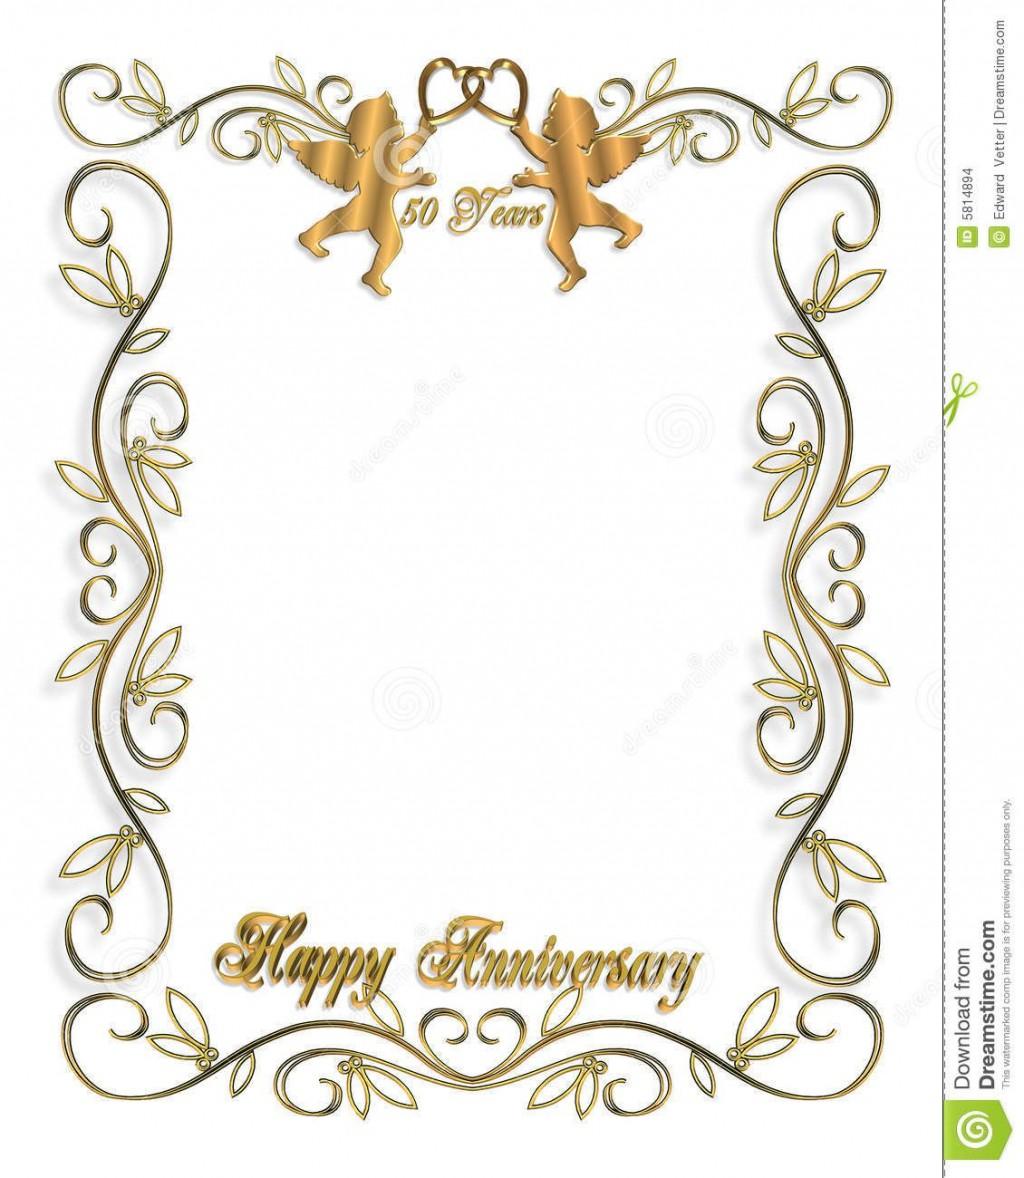 009 Excellent 50th Wedding Anniversary Invitation Template Free Design  Download Golden Microsoft WordLarge